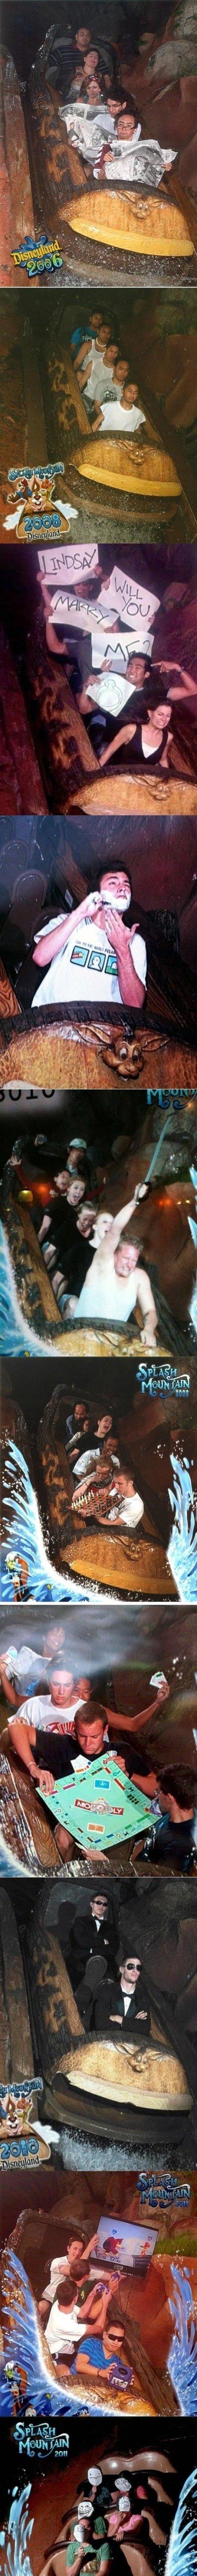 Splash Mountain comp.. funny pictures from Disneyland's Splash Mountain.. OMG =O